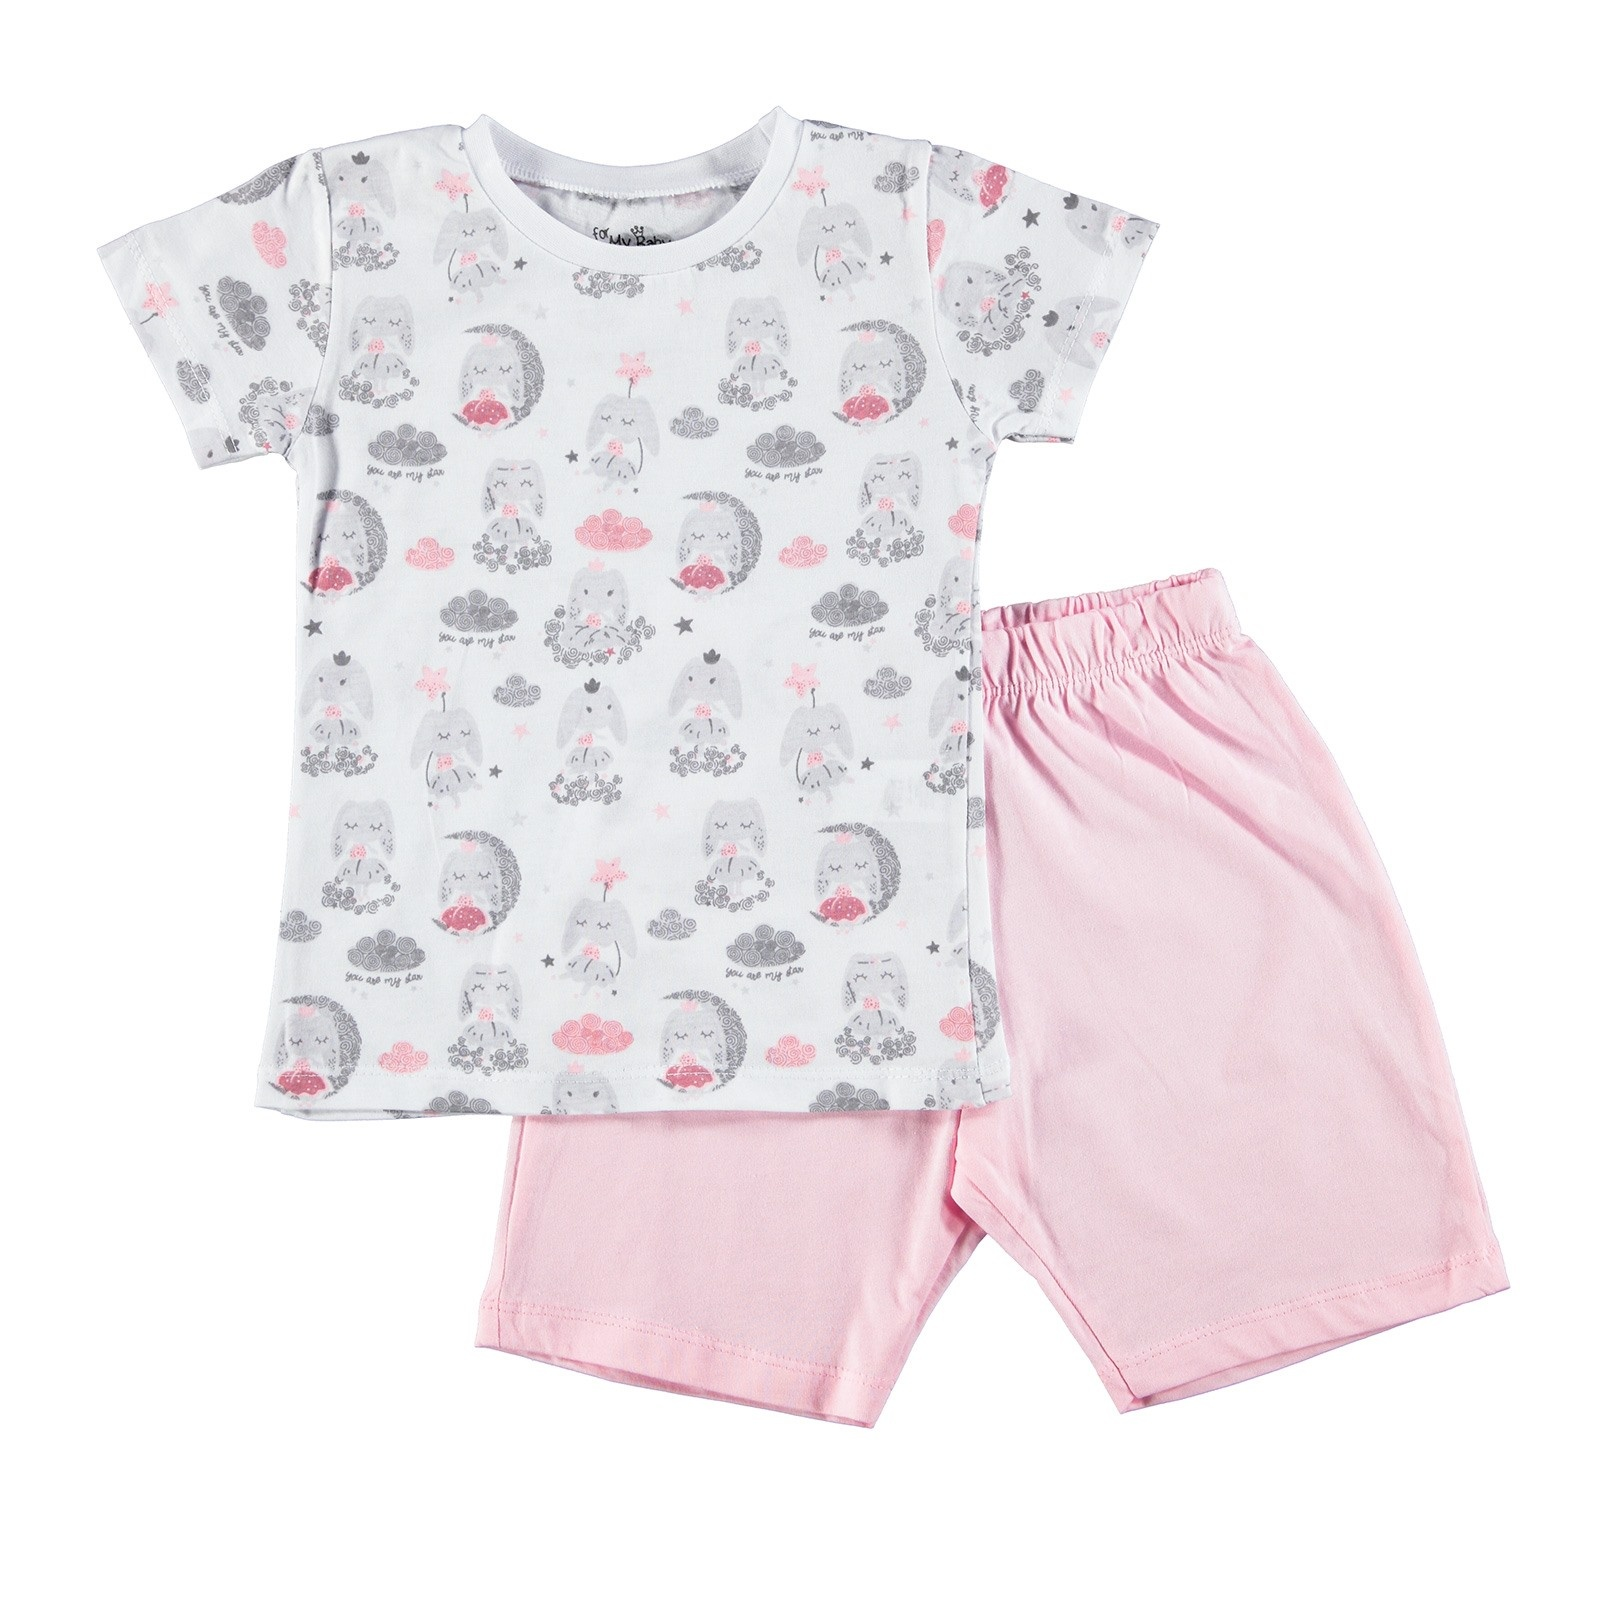 Ebebek For My Baby Boy Baloon Printed Short SleevePyjamas